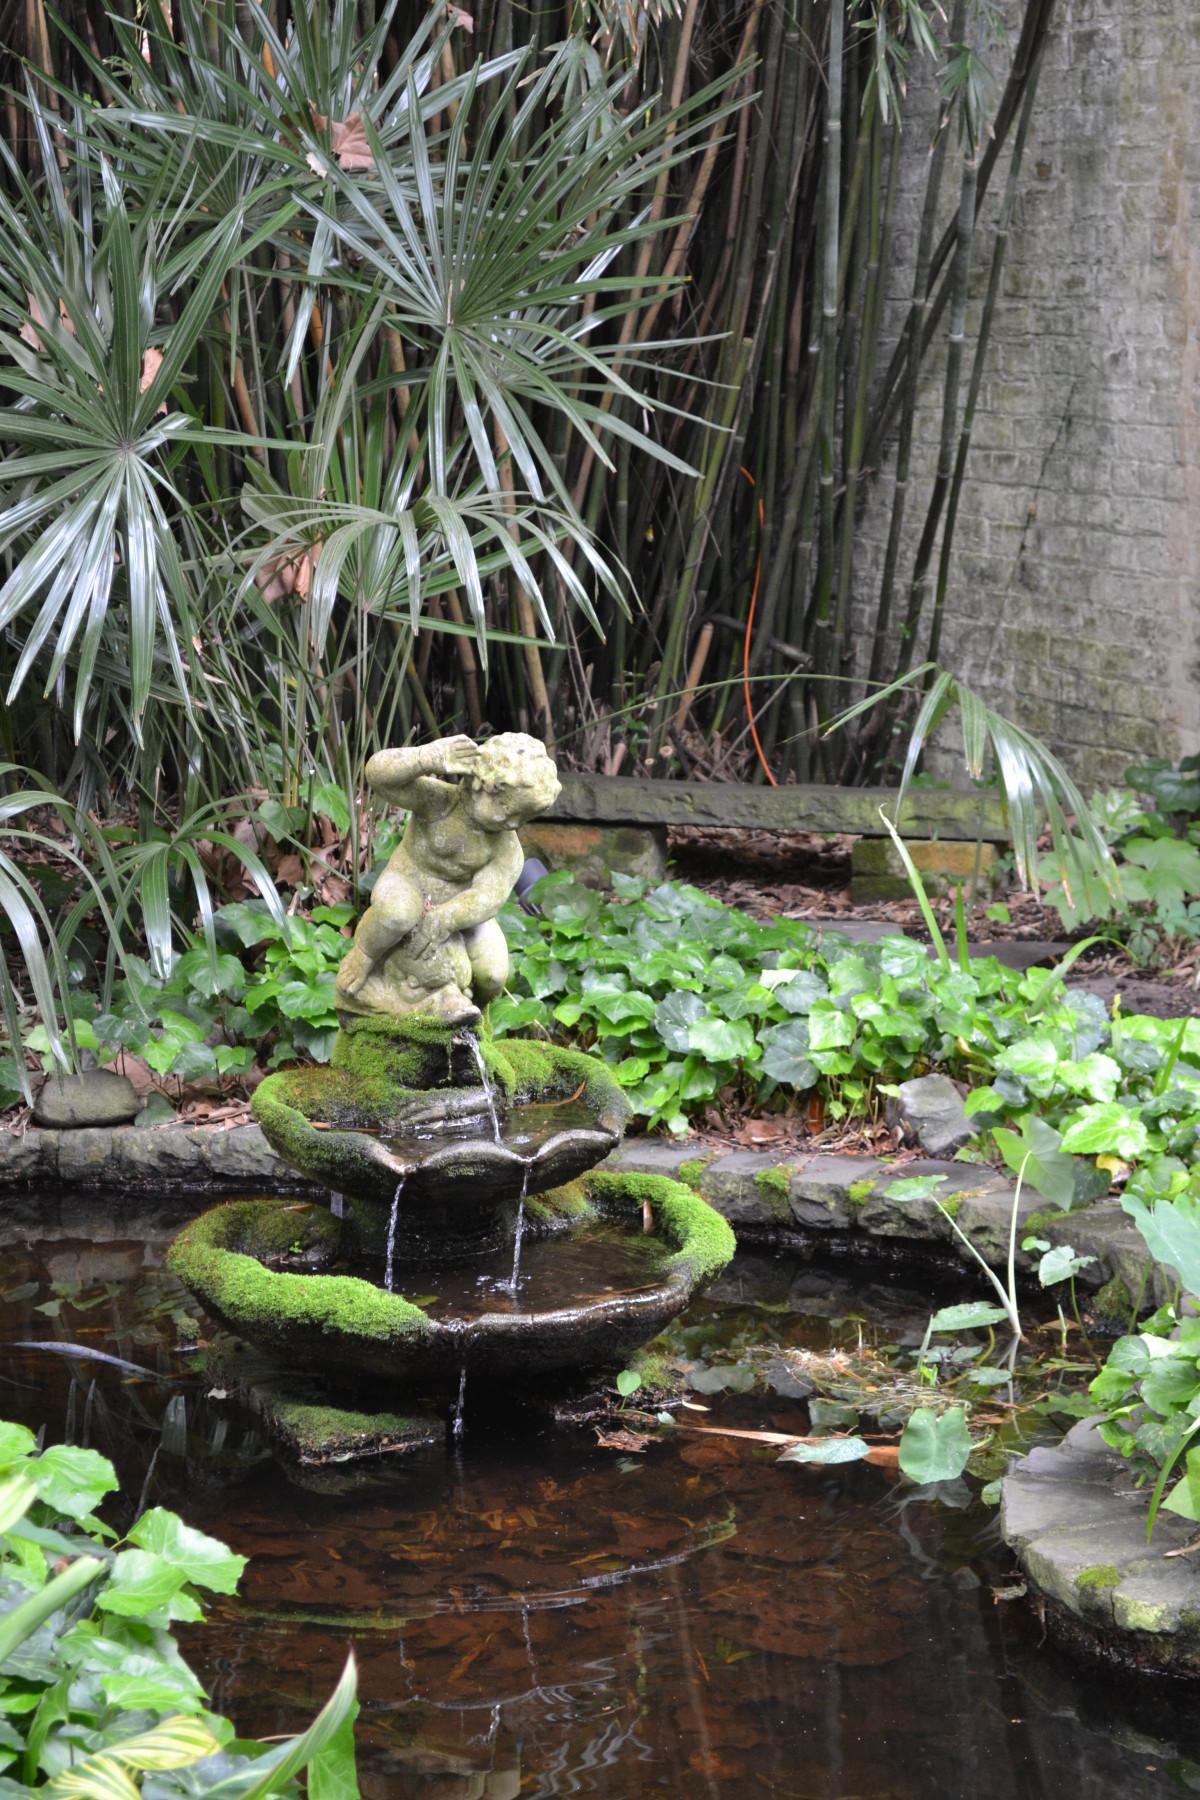 Tree, Plant, Flower, Old, Pond, Stream